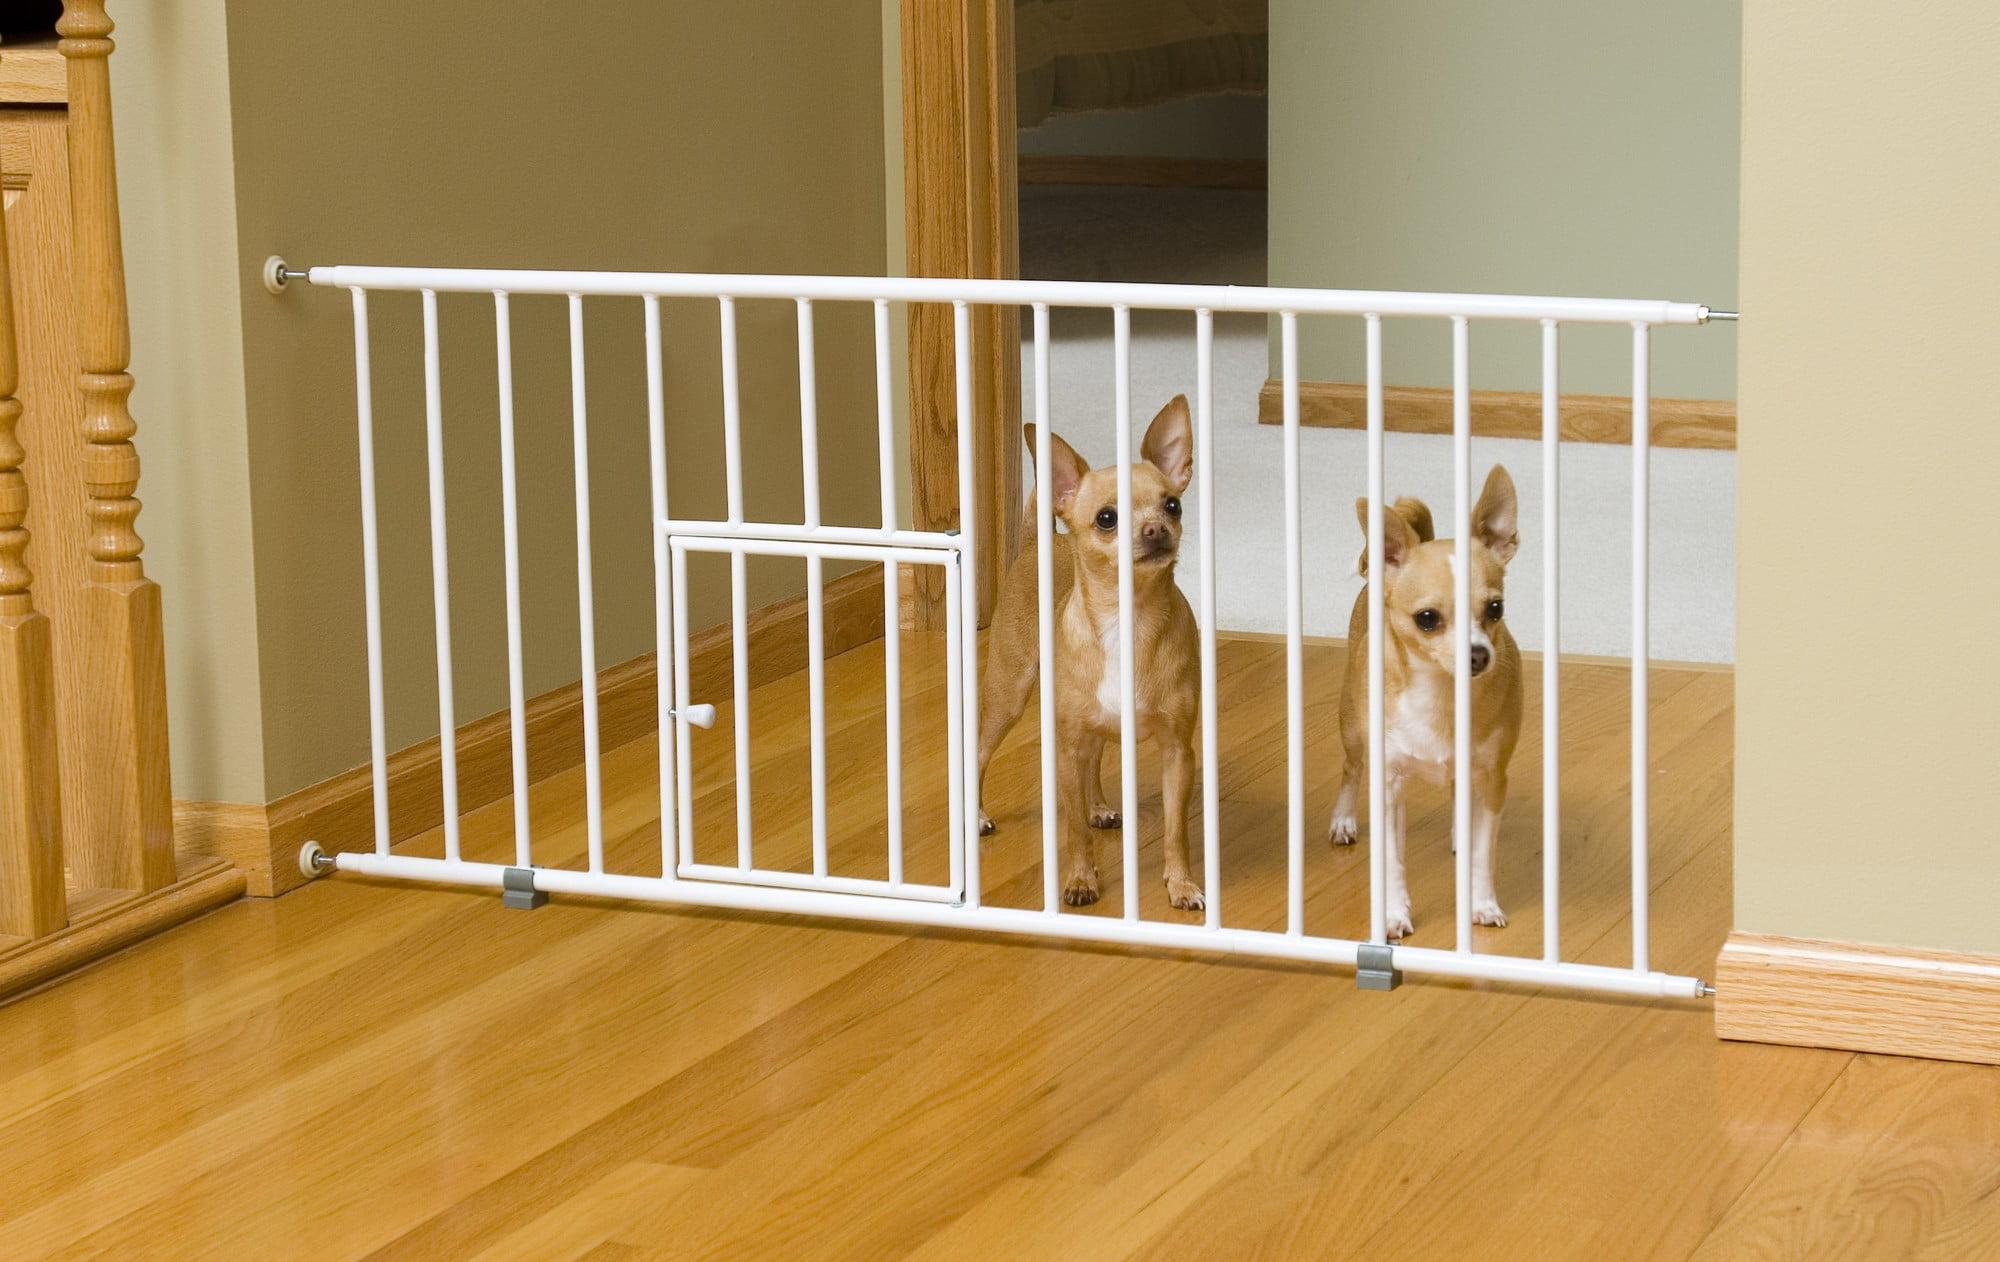 Carlson mini gate with pet door walmart eventelaan Image collections